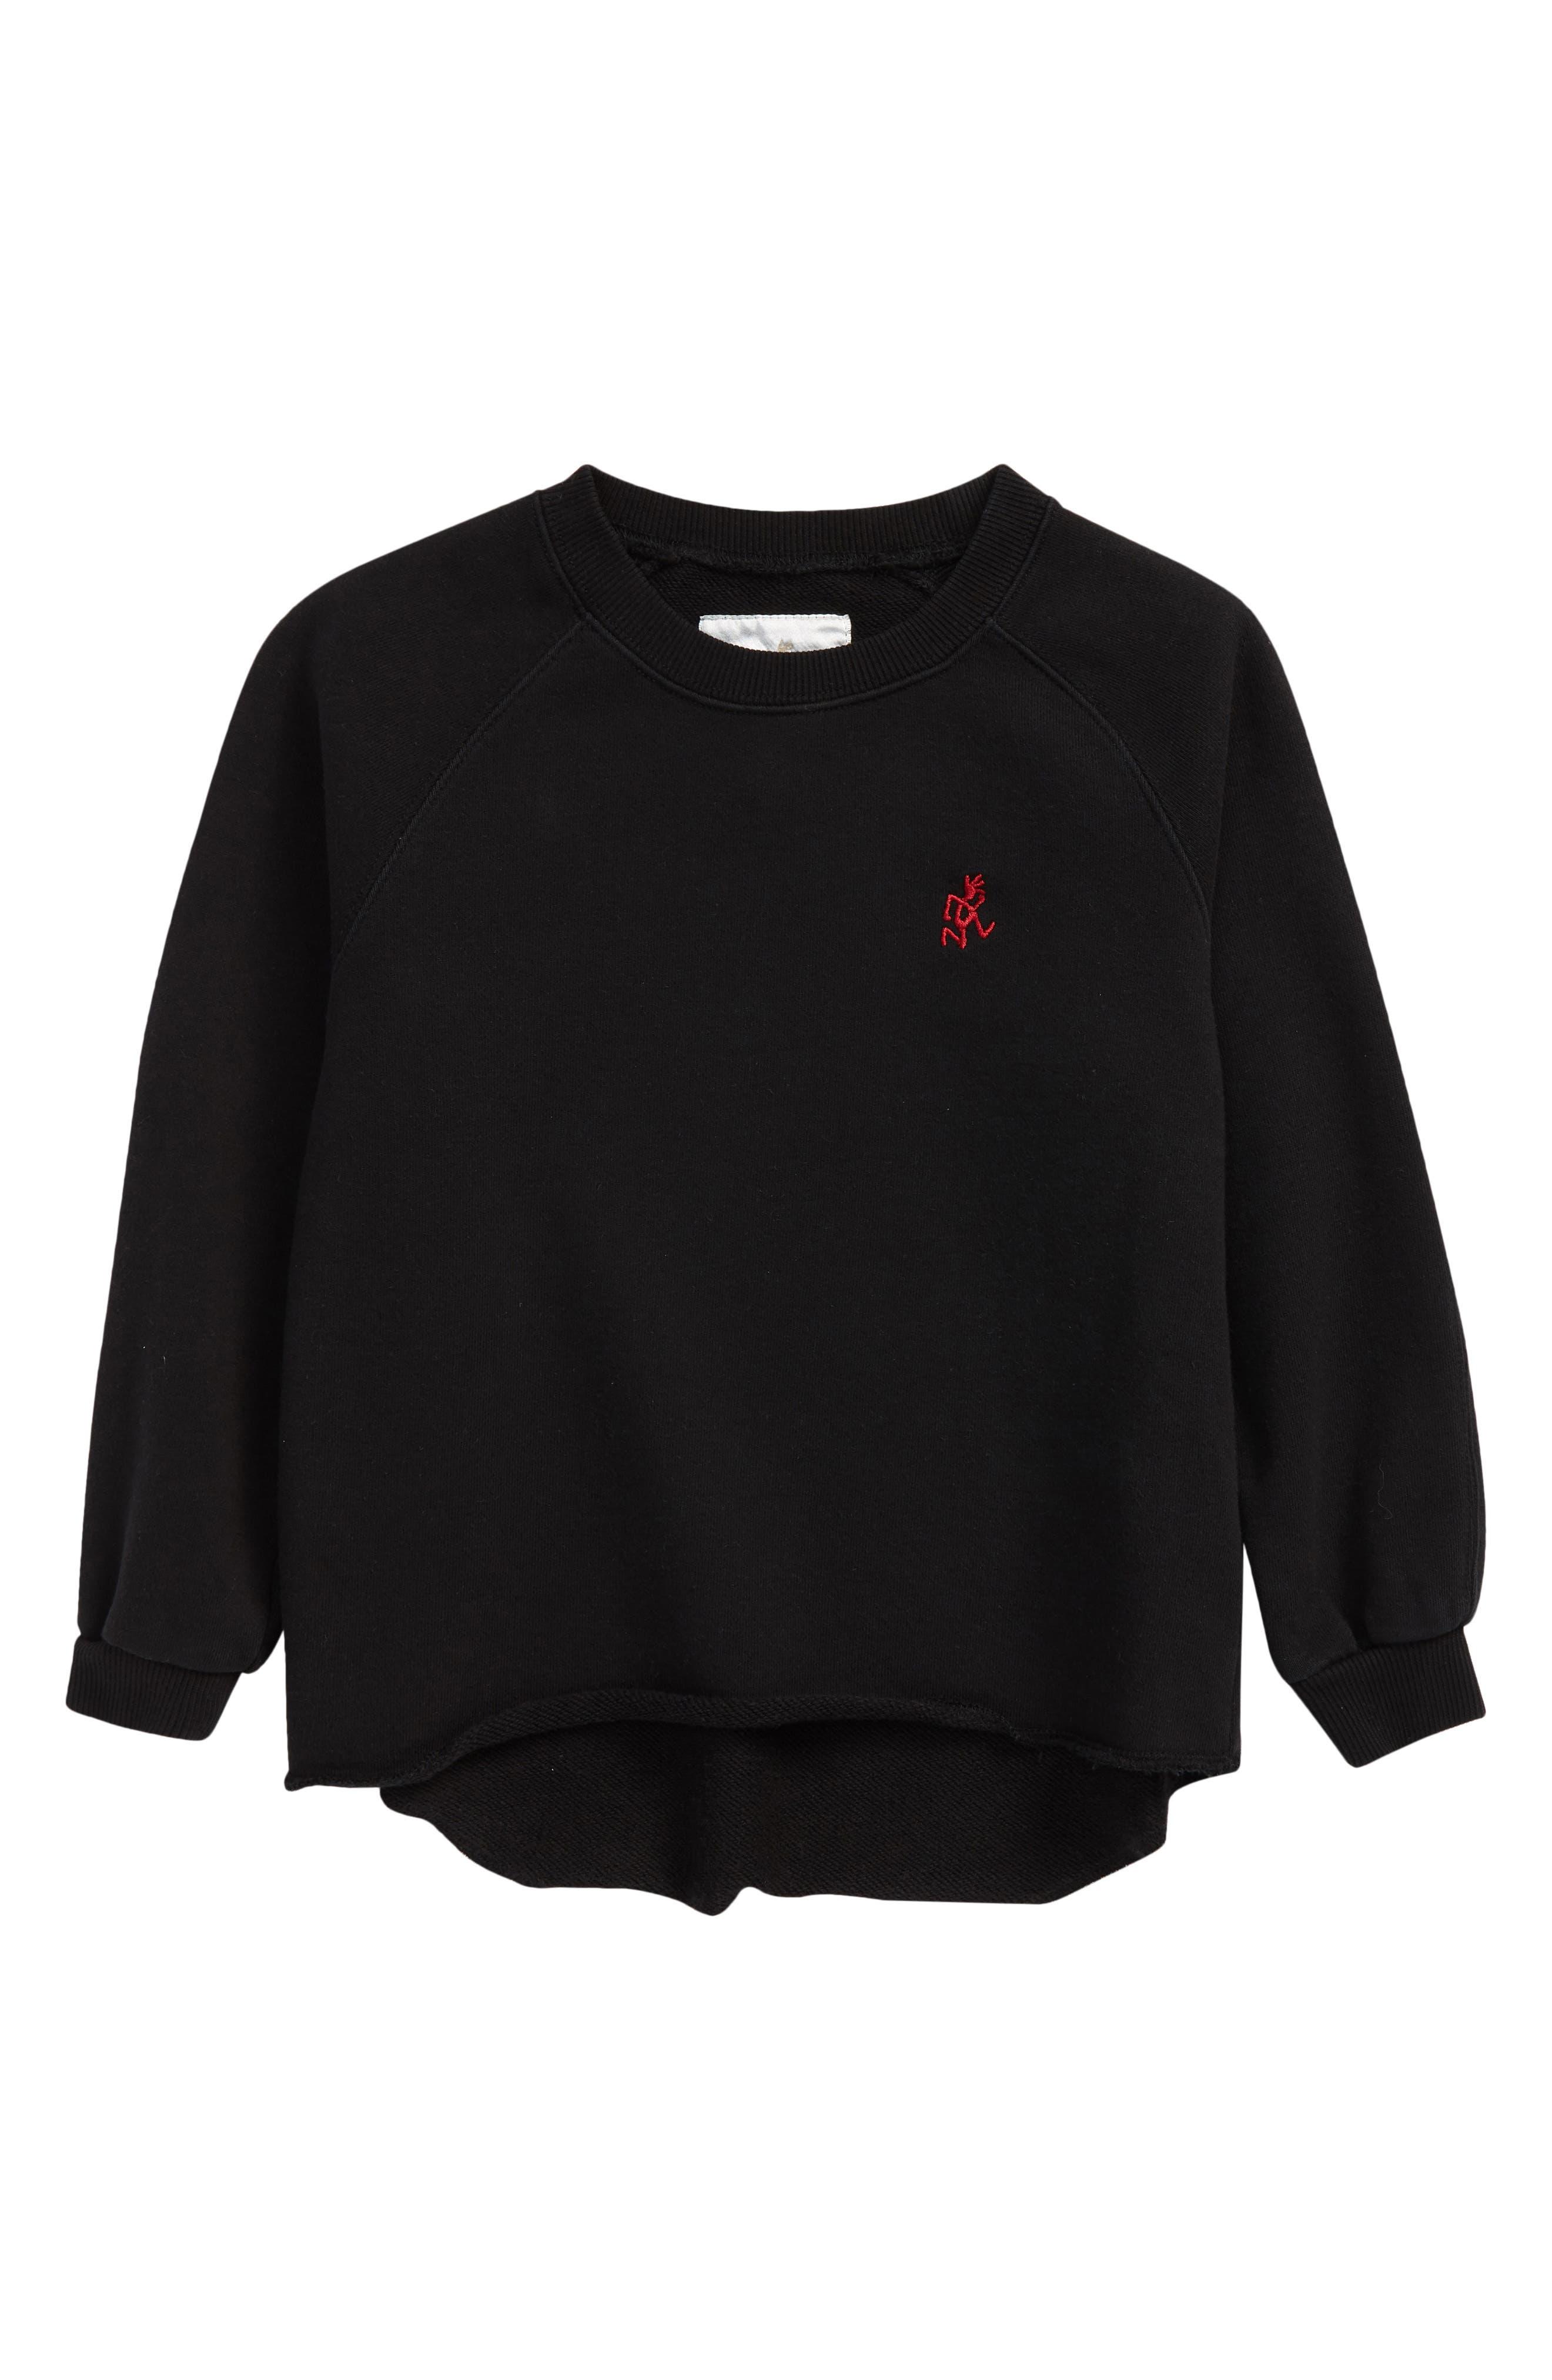 Kids' Talecut Crewneck Sweatshirt